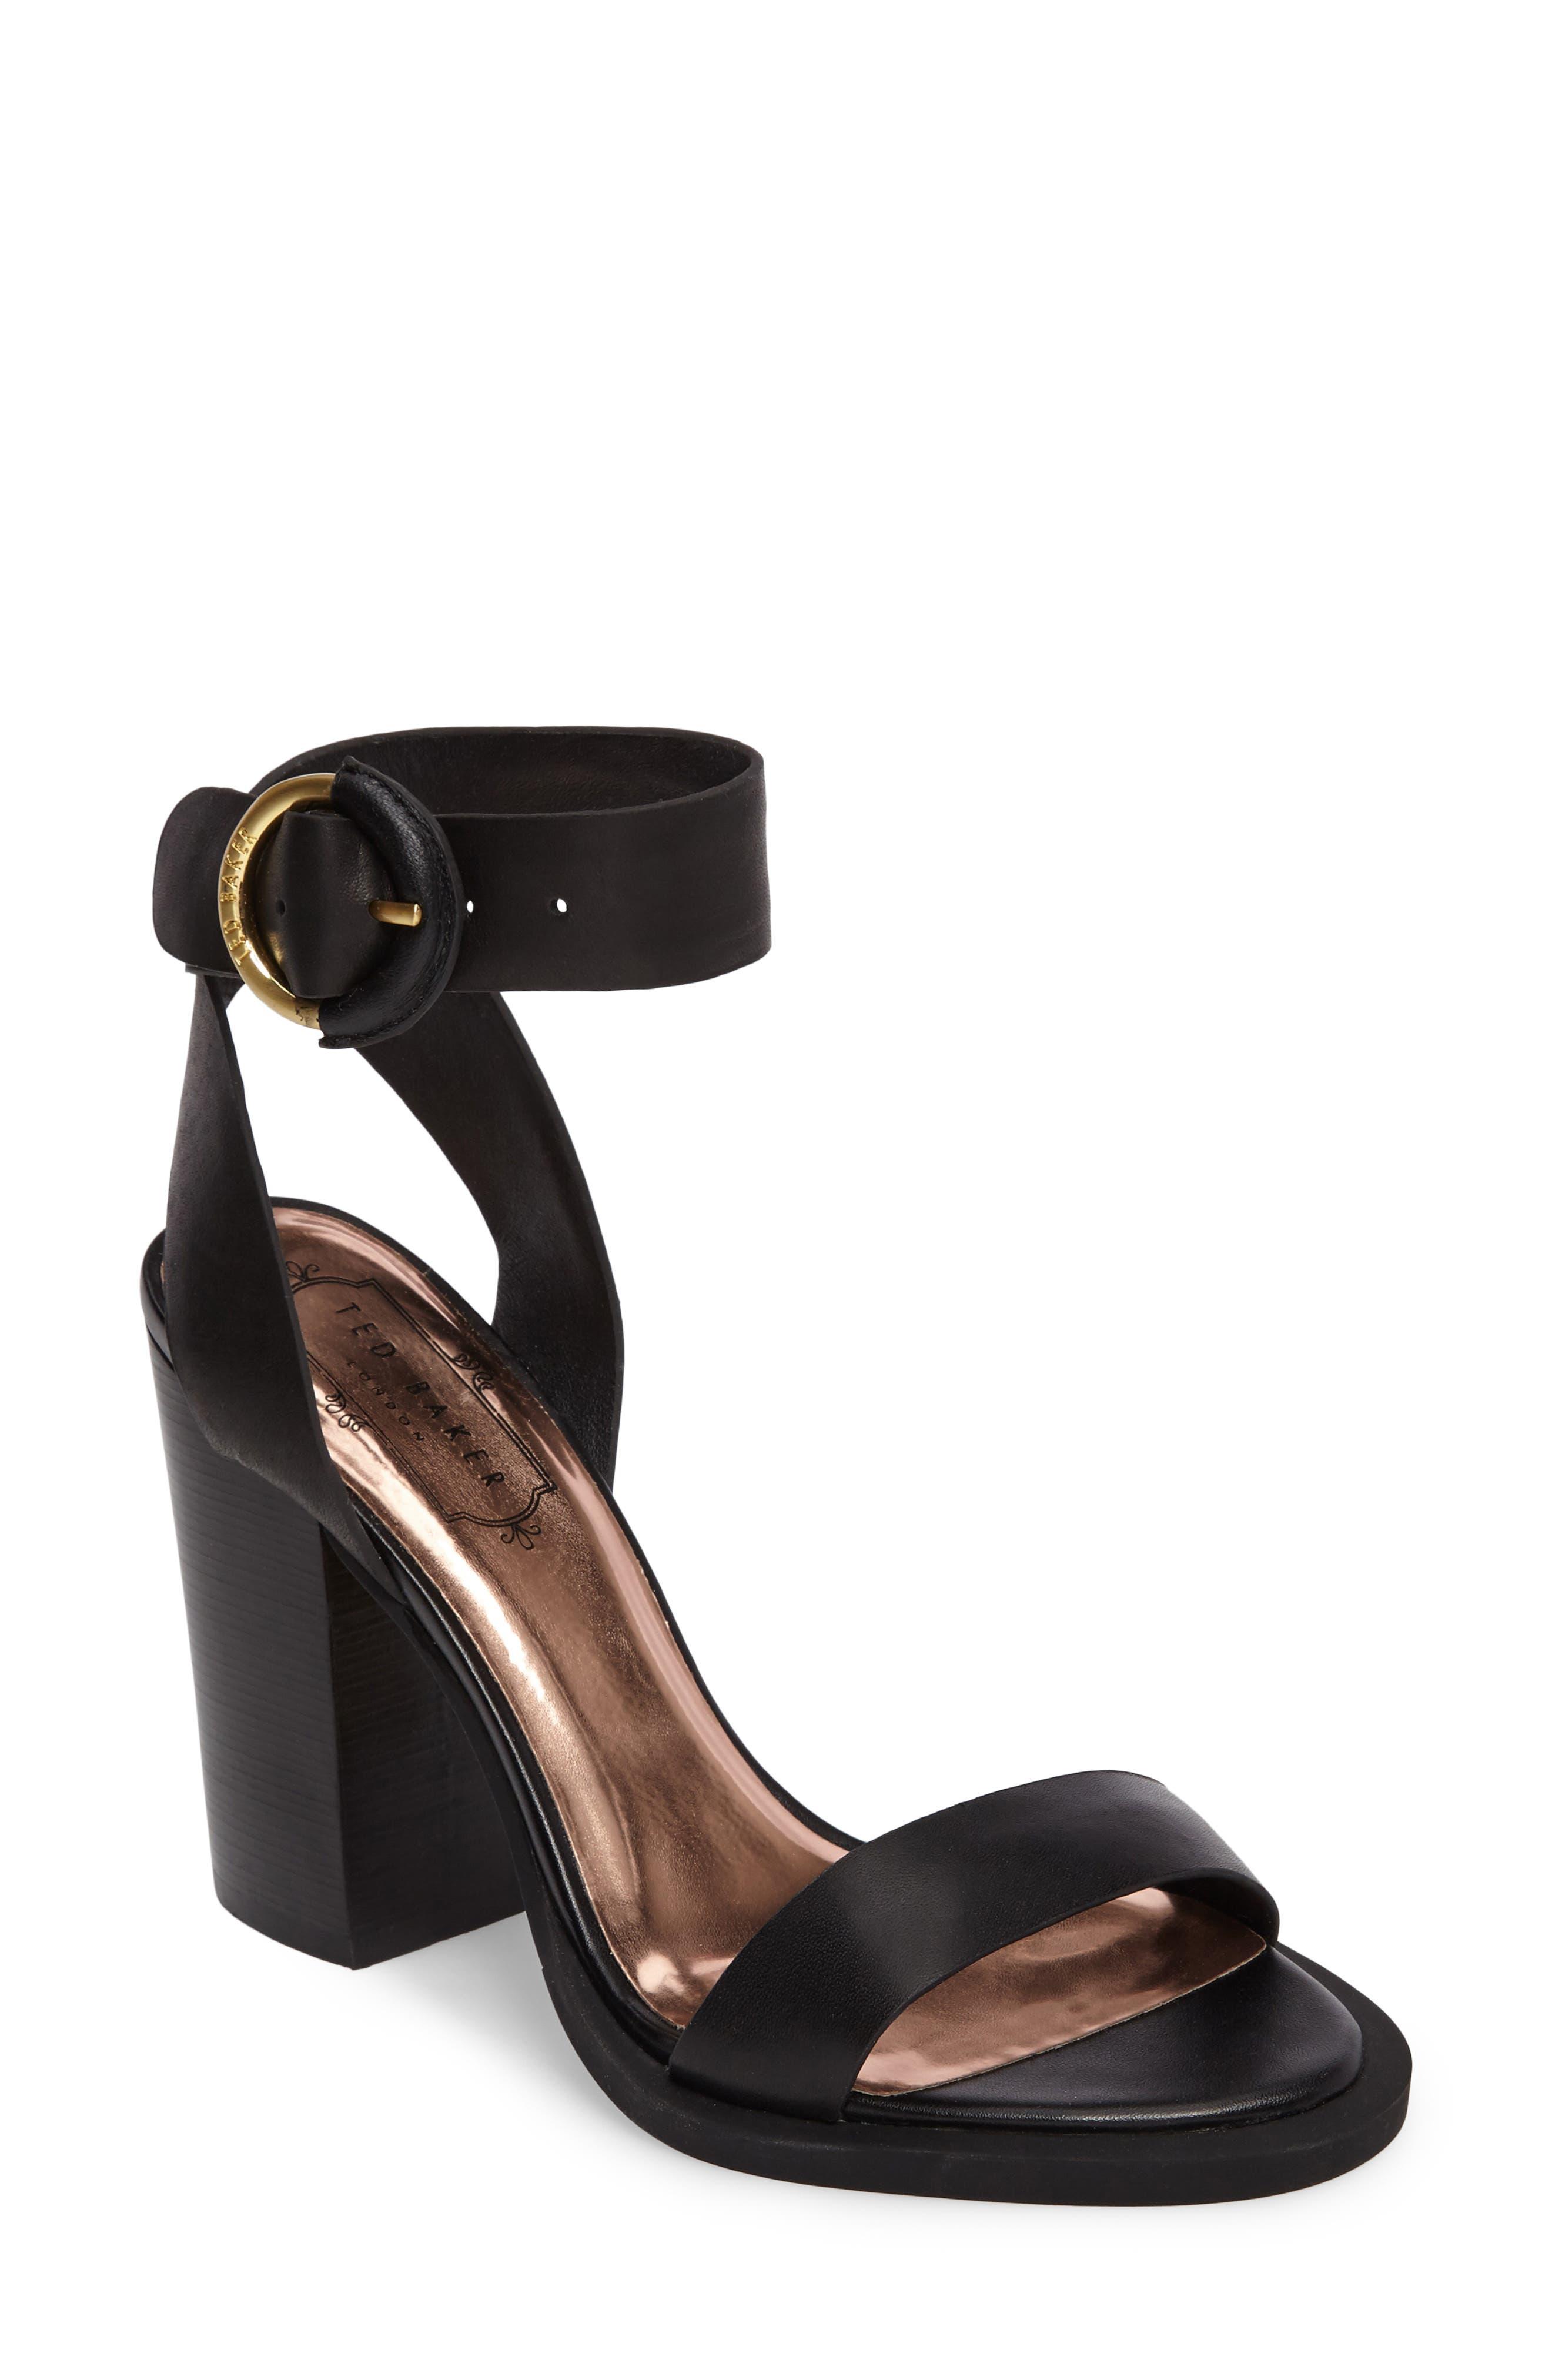 Betciy Ankle Strap Sandal,                         Main,                         color, Black Leather